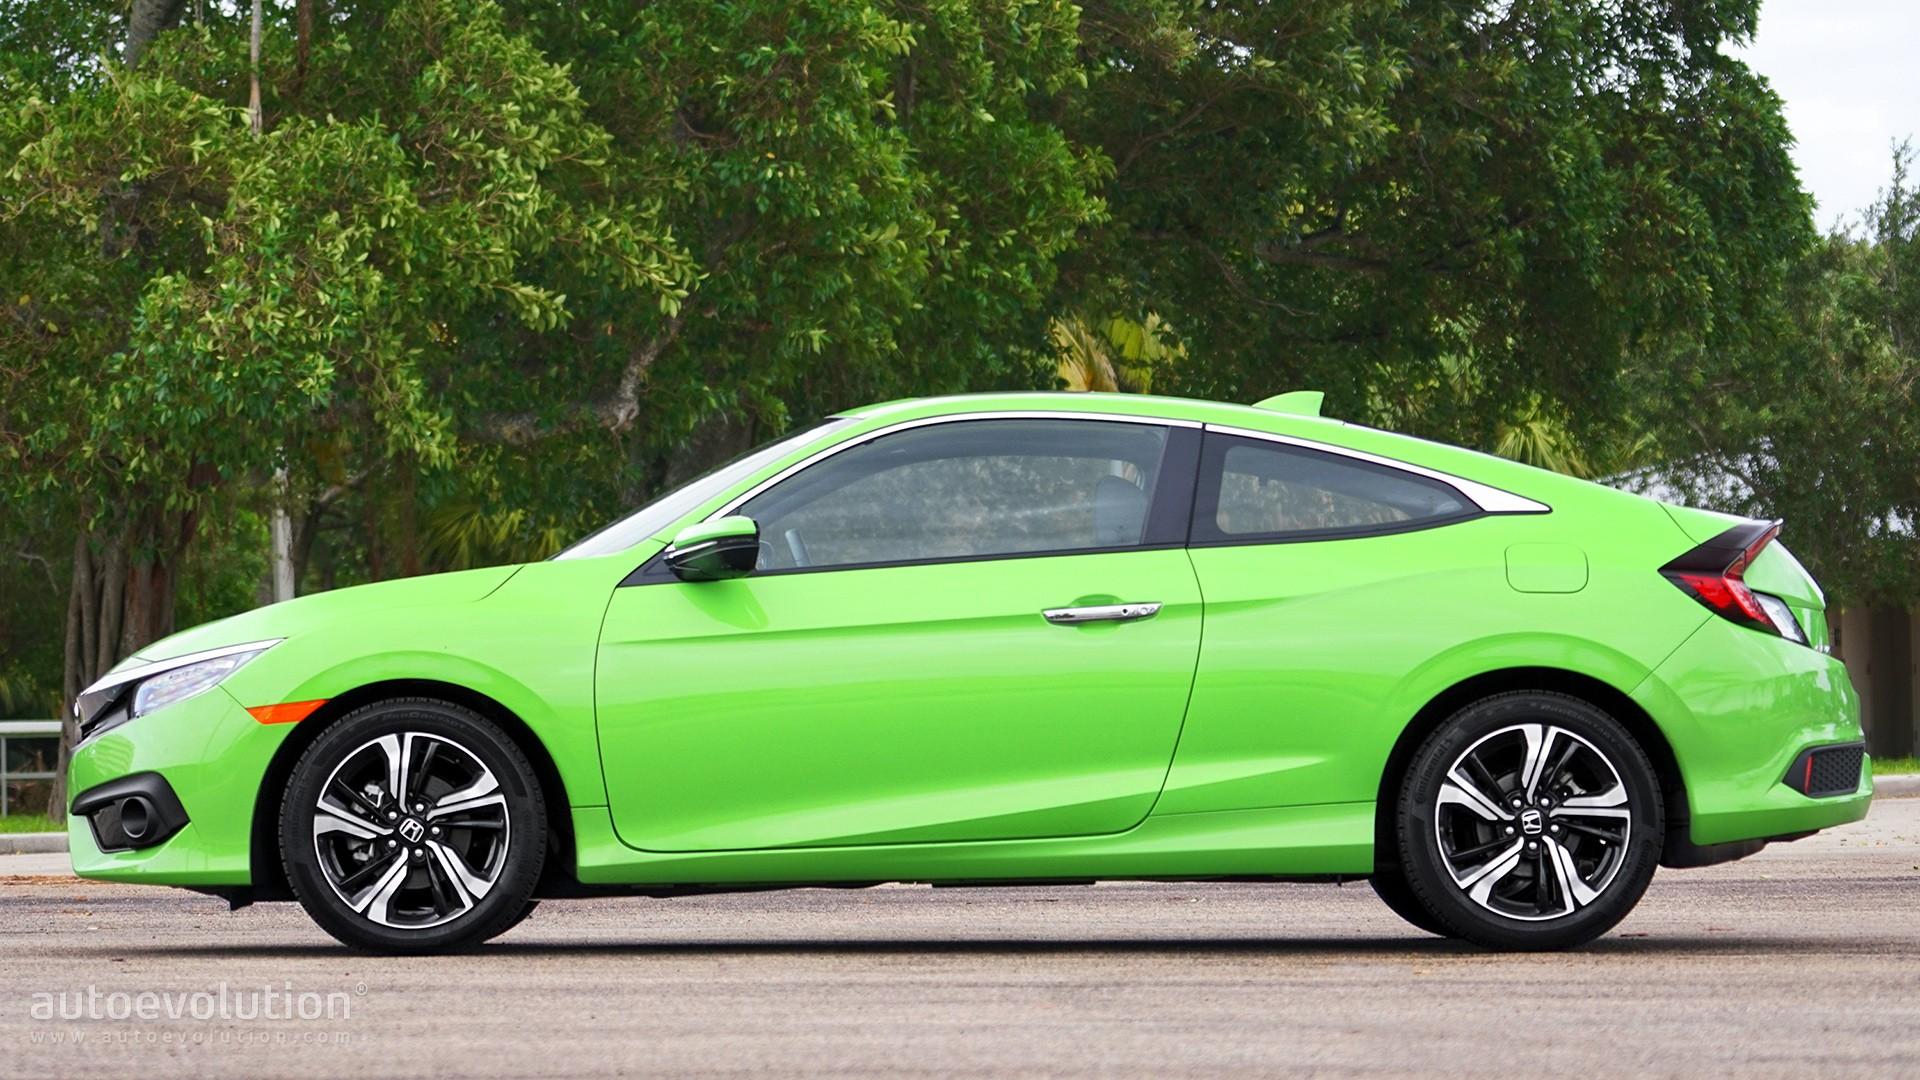 Driven 2017 honda civic coupe 1 5t autoevolution for 2017 honda civic green